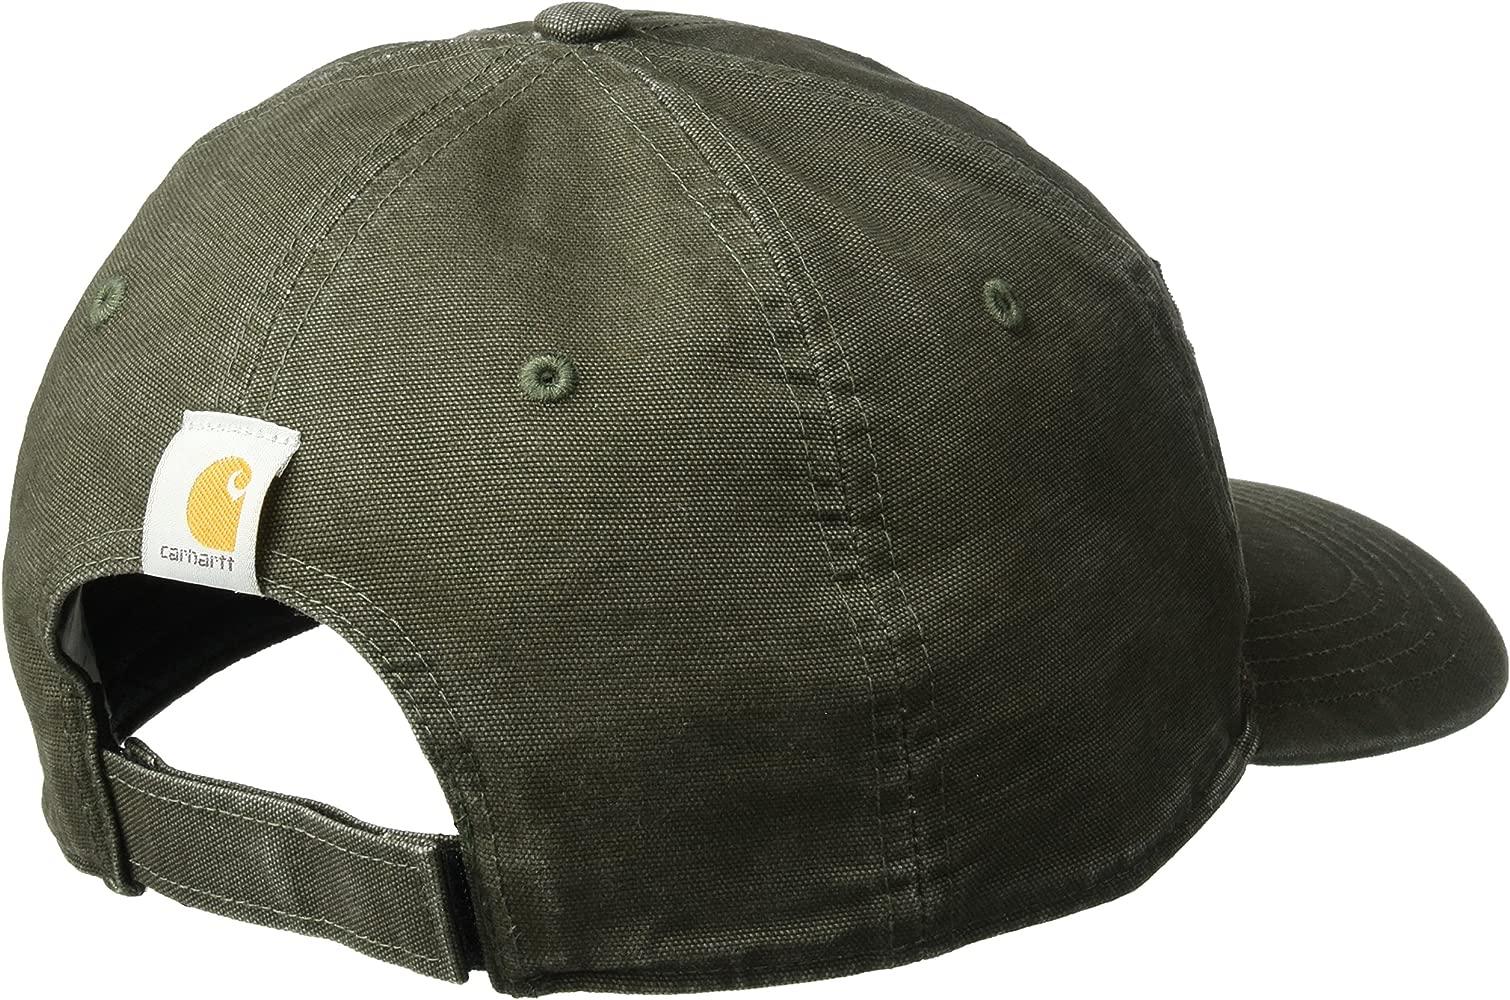 Carhartt Hombre 103270 Gorra de béisbol - Marrón - Talla de un ...